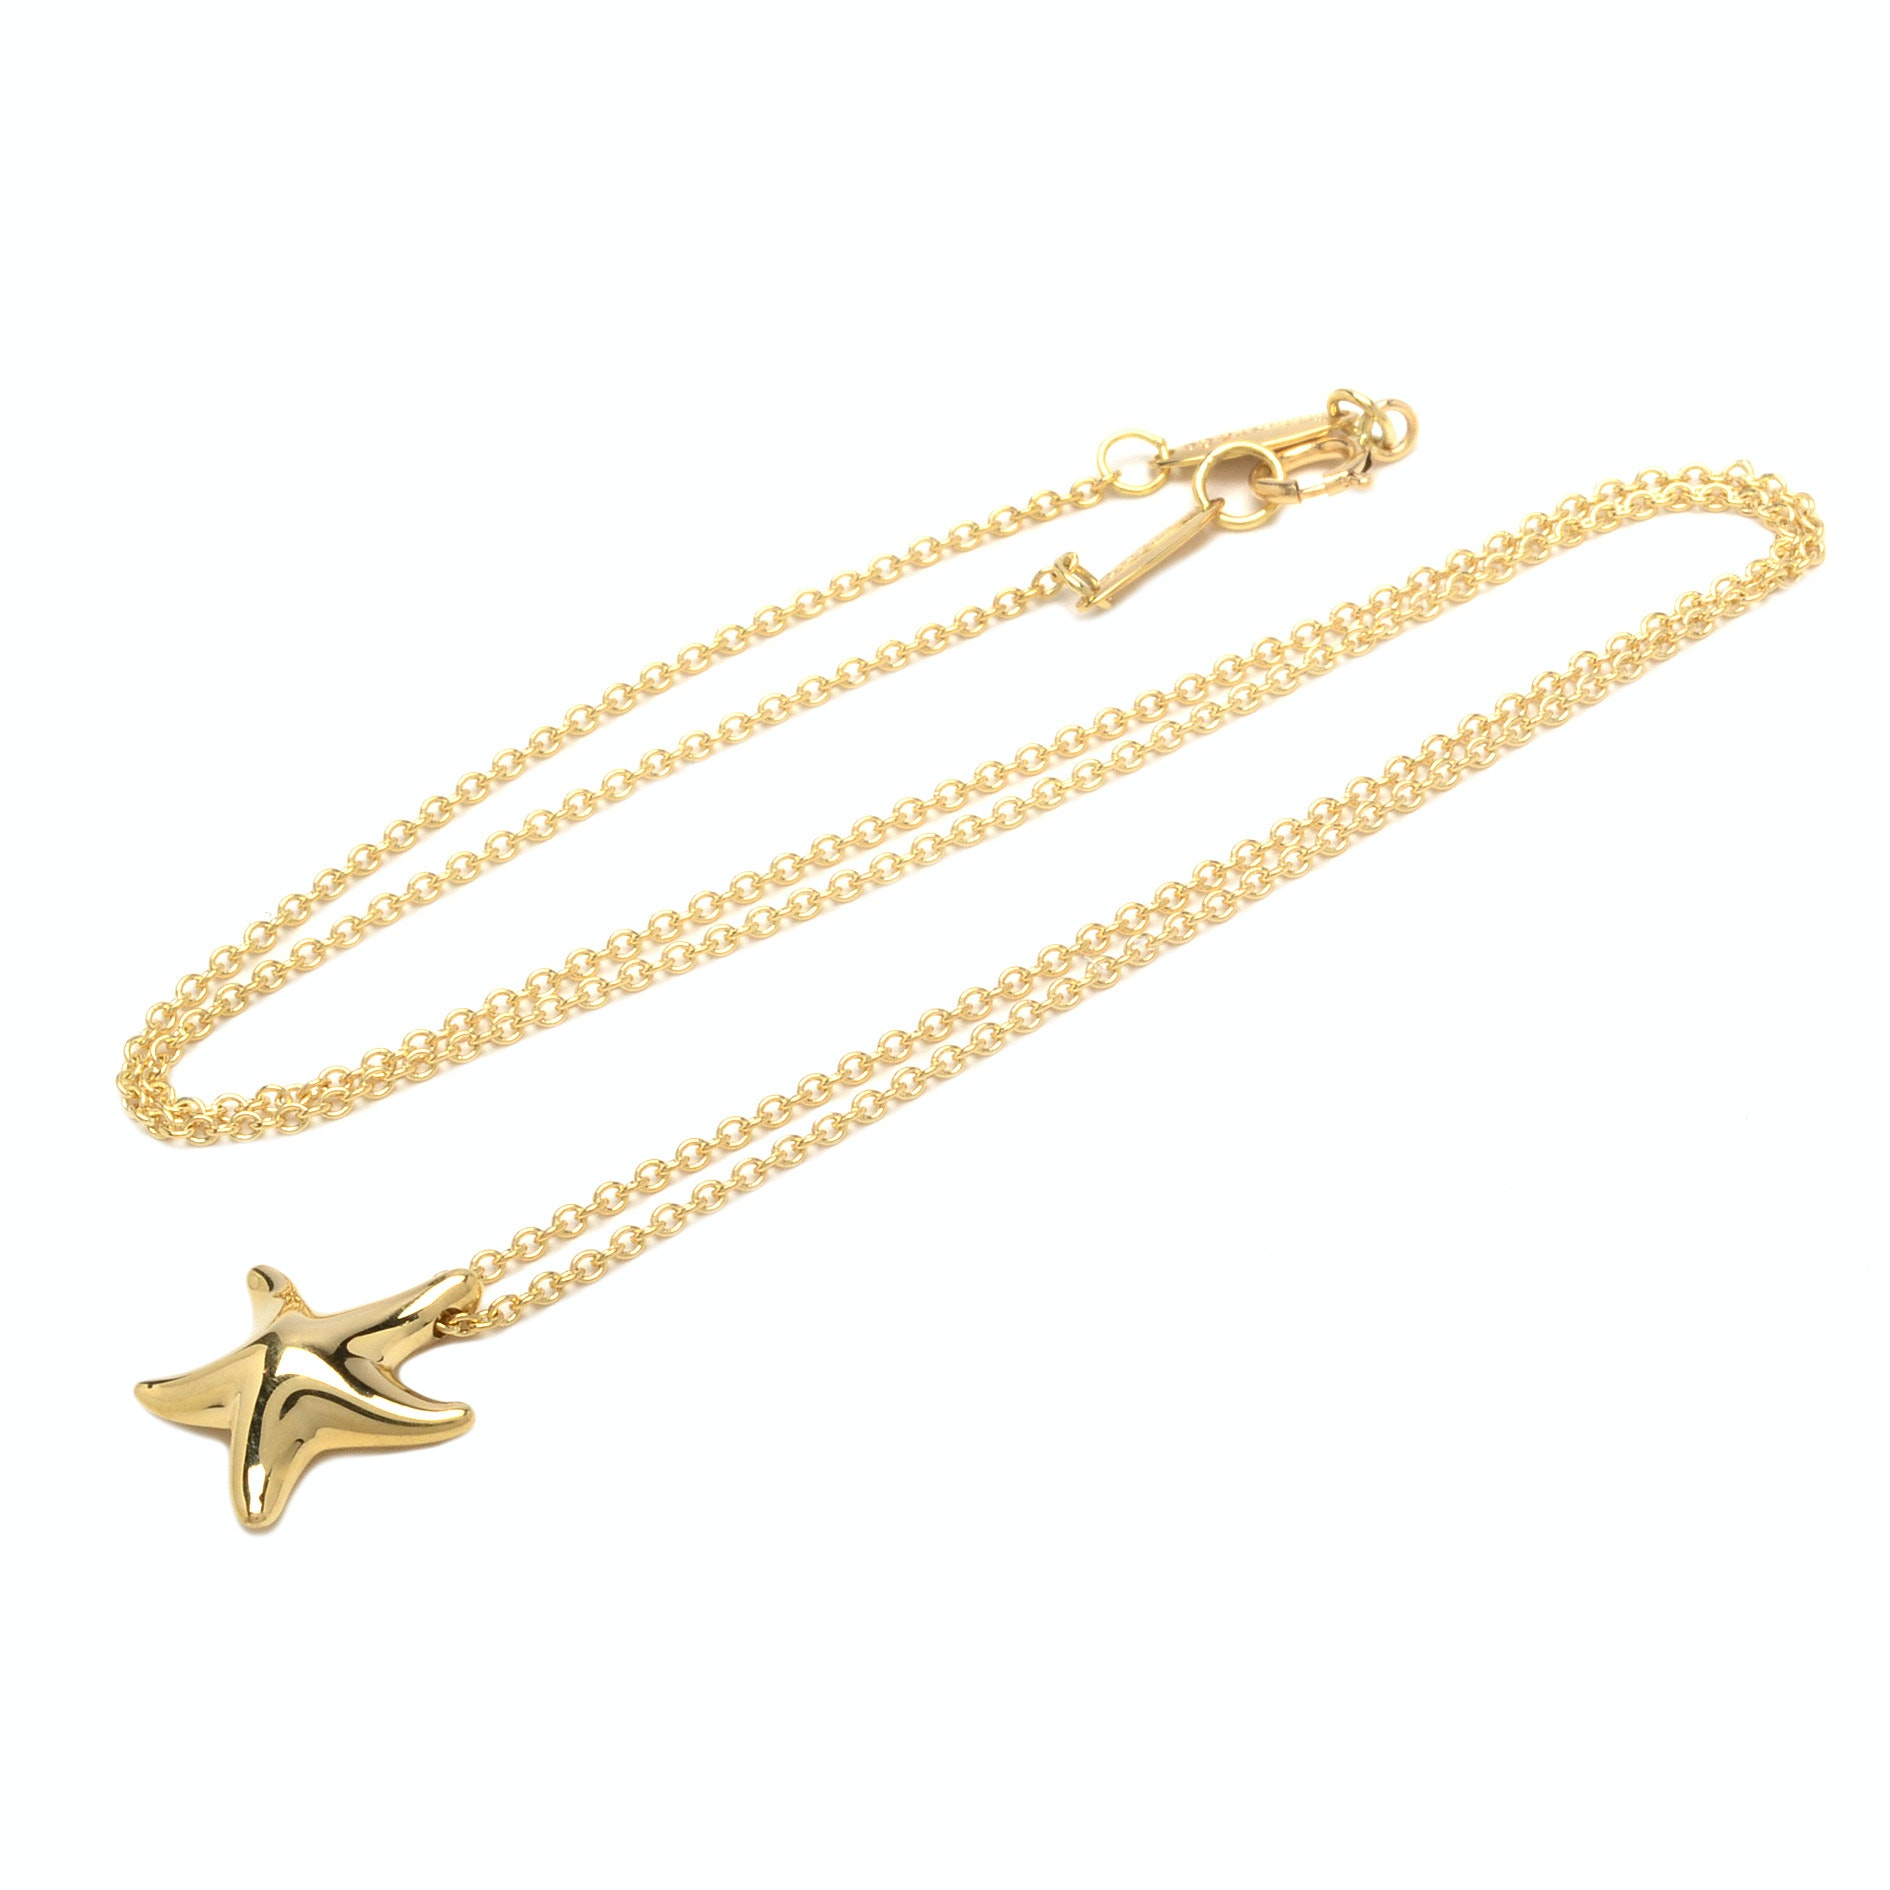 Tiffany & Co. Elsa Peretti ® 18K Yellow Gold Starfish Pendant Necklace